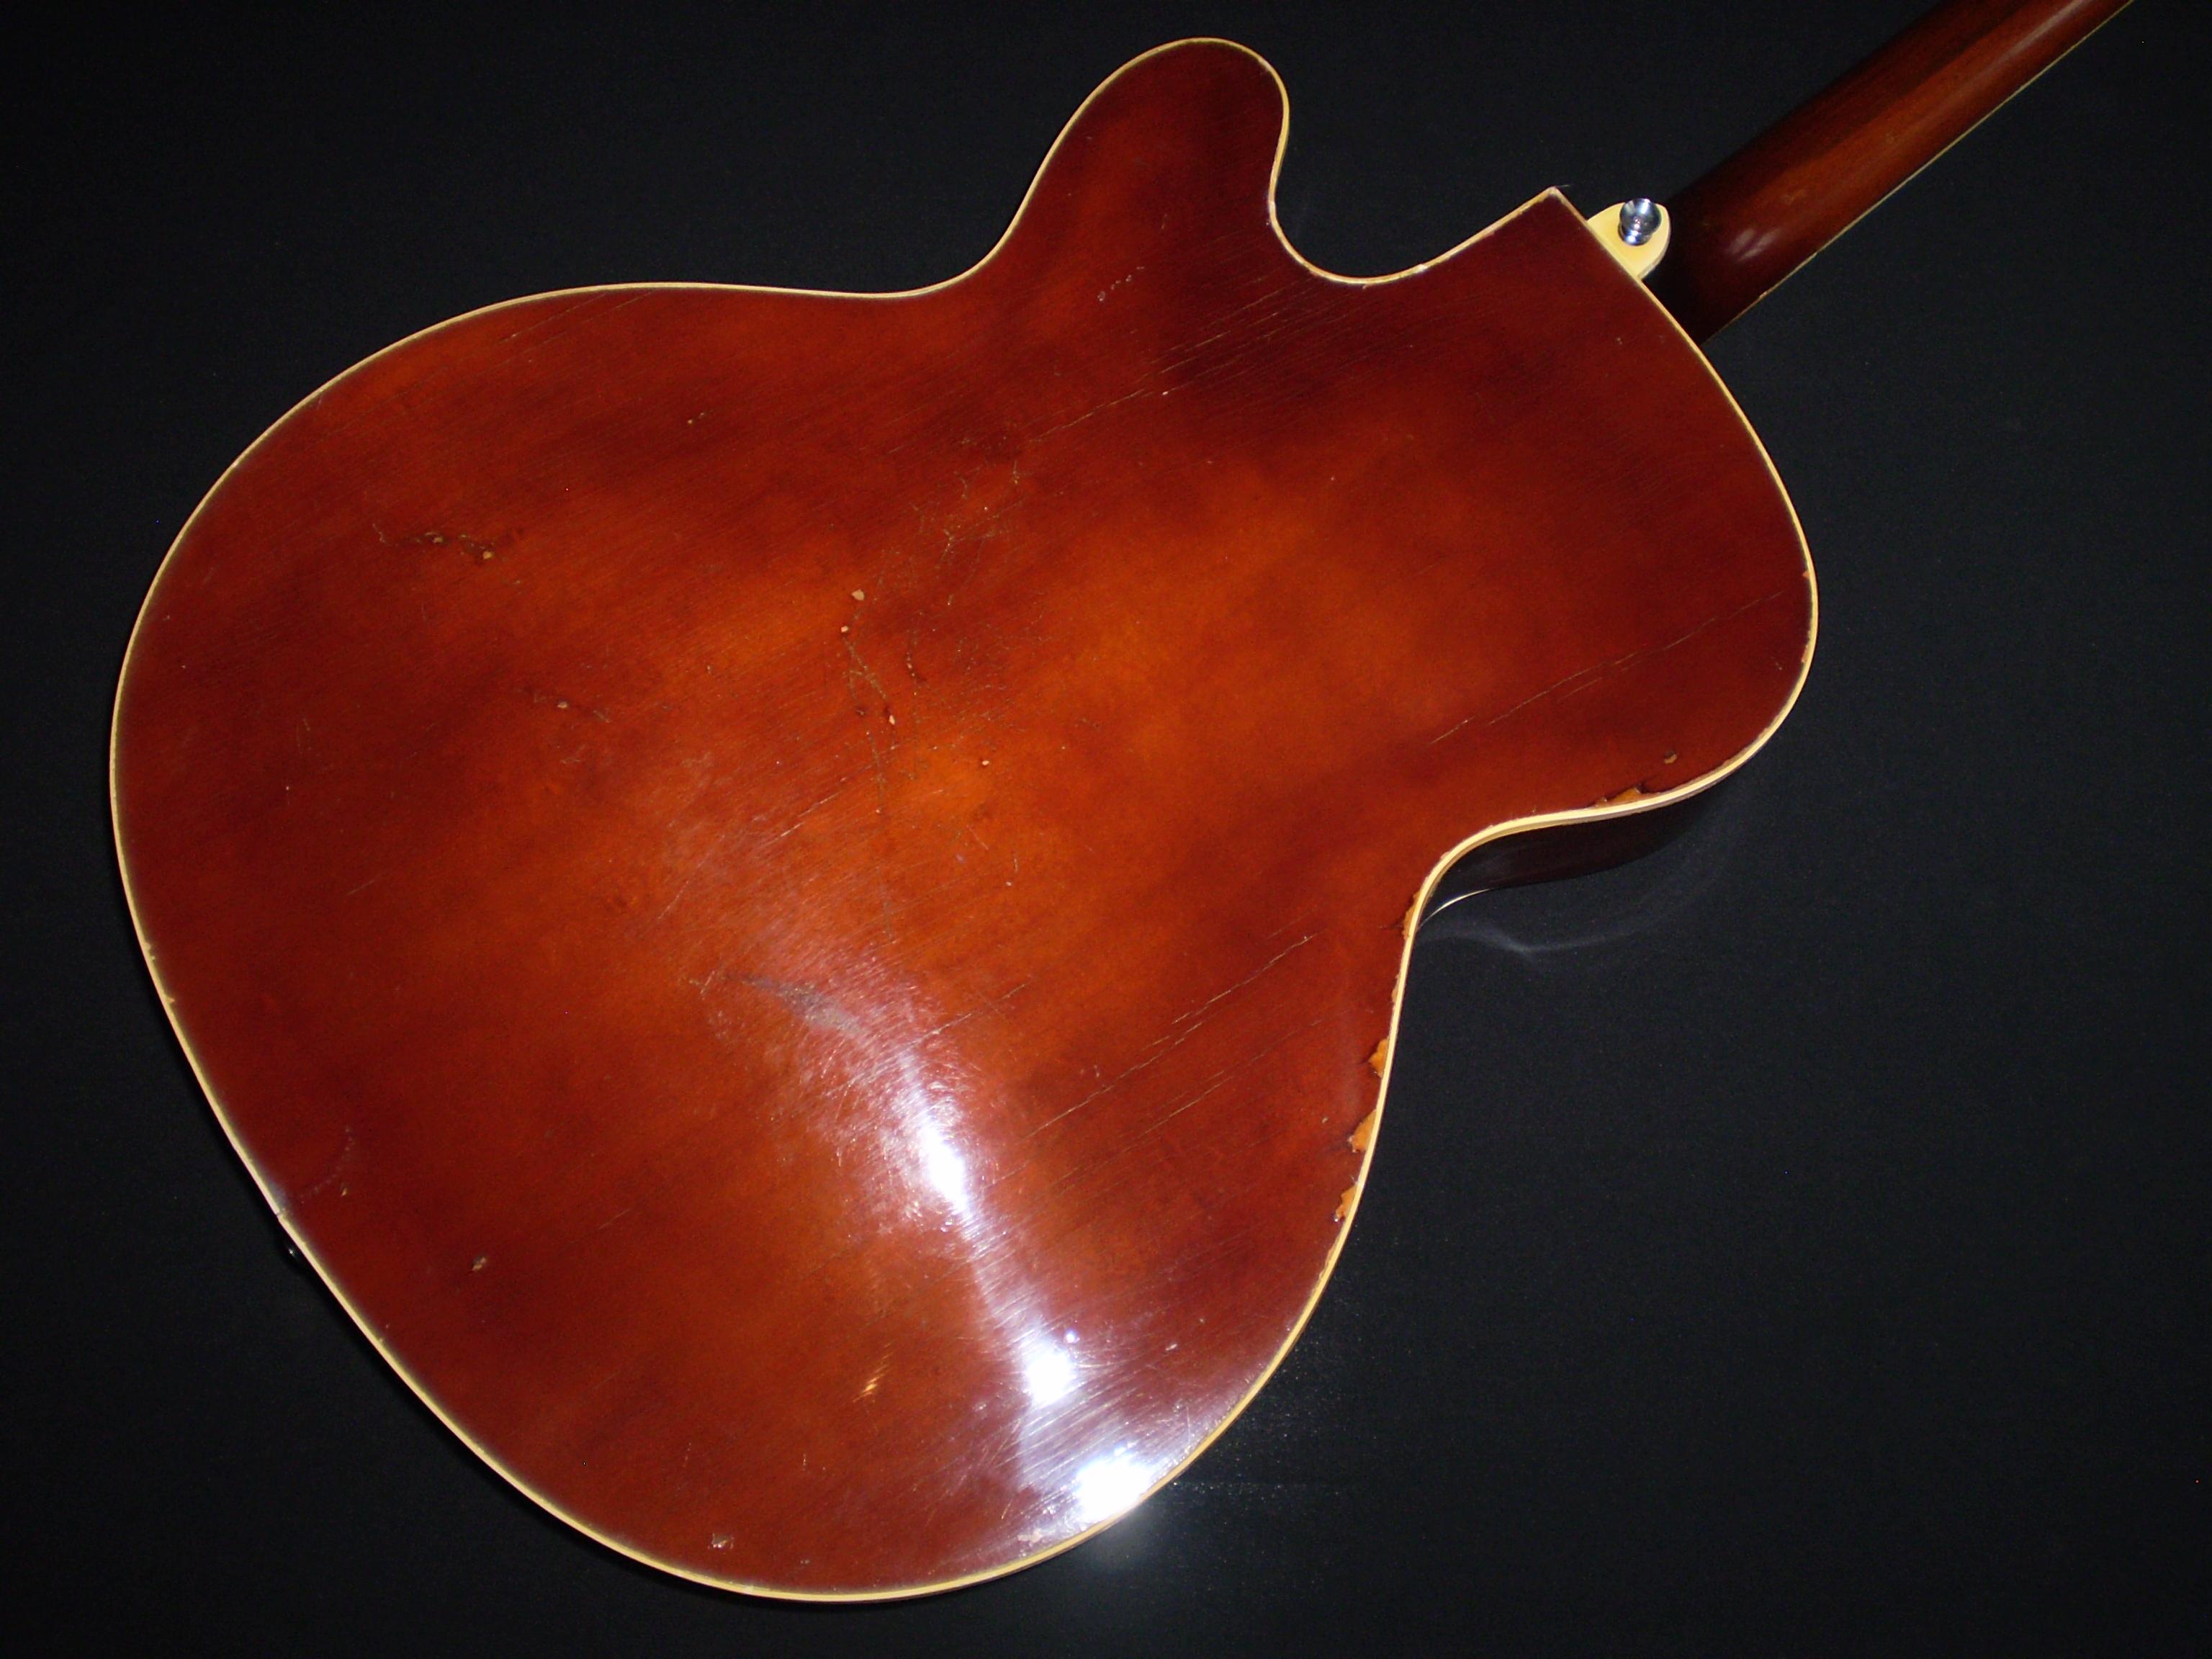 9005a5ae61bc6 Epiphone Zephyr 1956 Sunburst Guitar For Sale Glenns Guitars